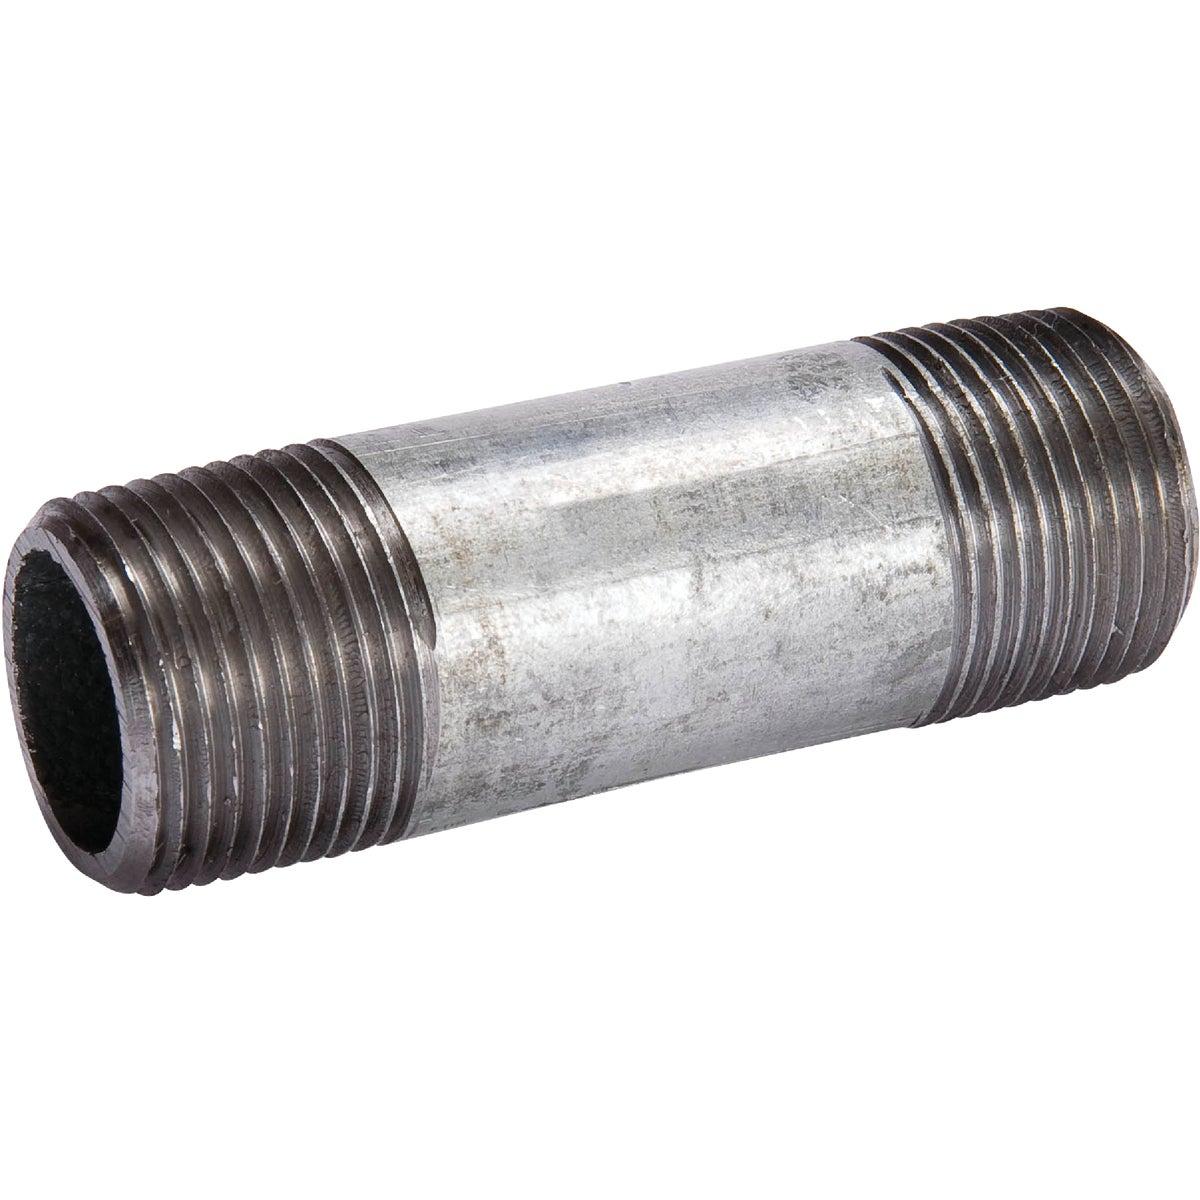 Southland Pipe Nipple 1/2X5-1/2 GALV NIPPLE 10409